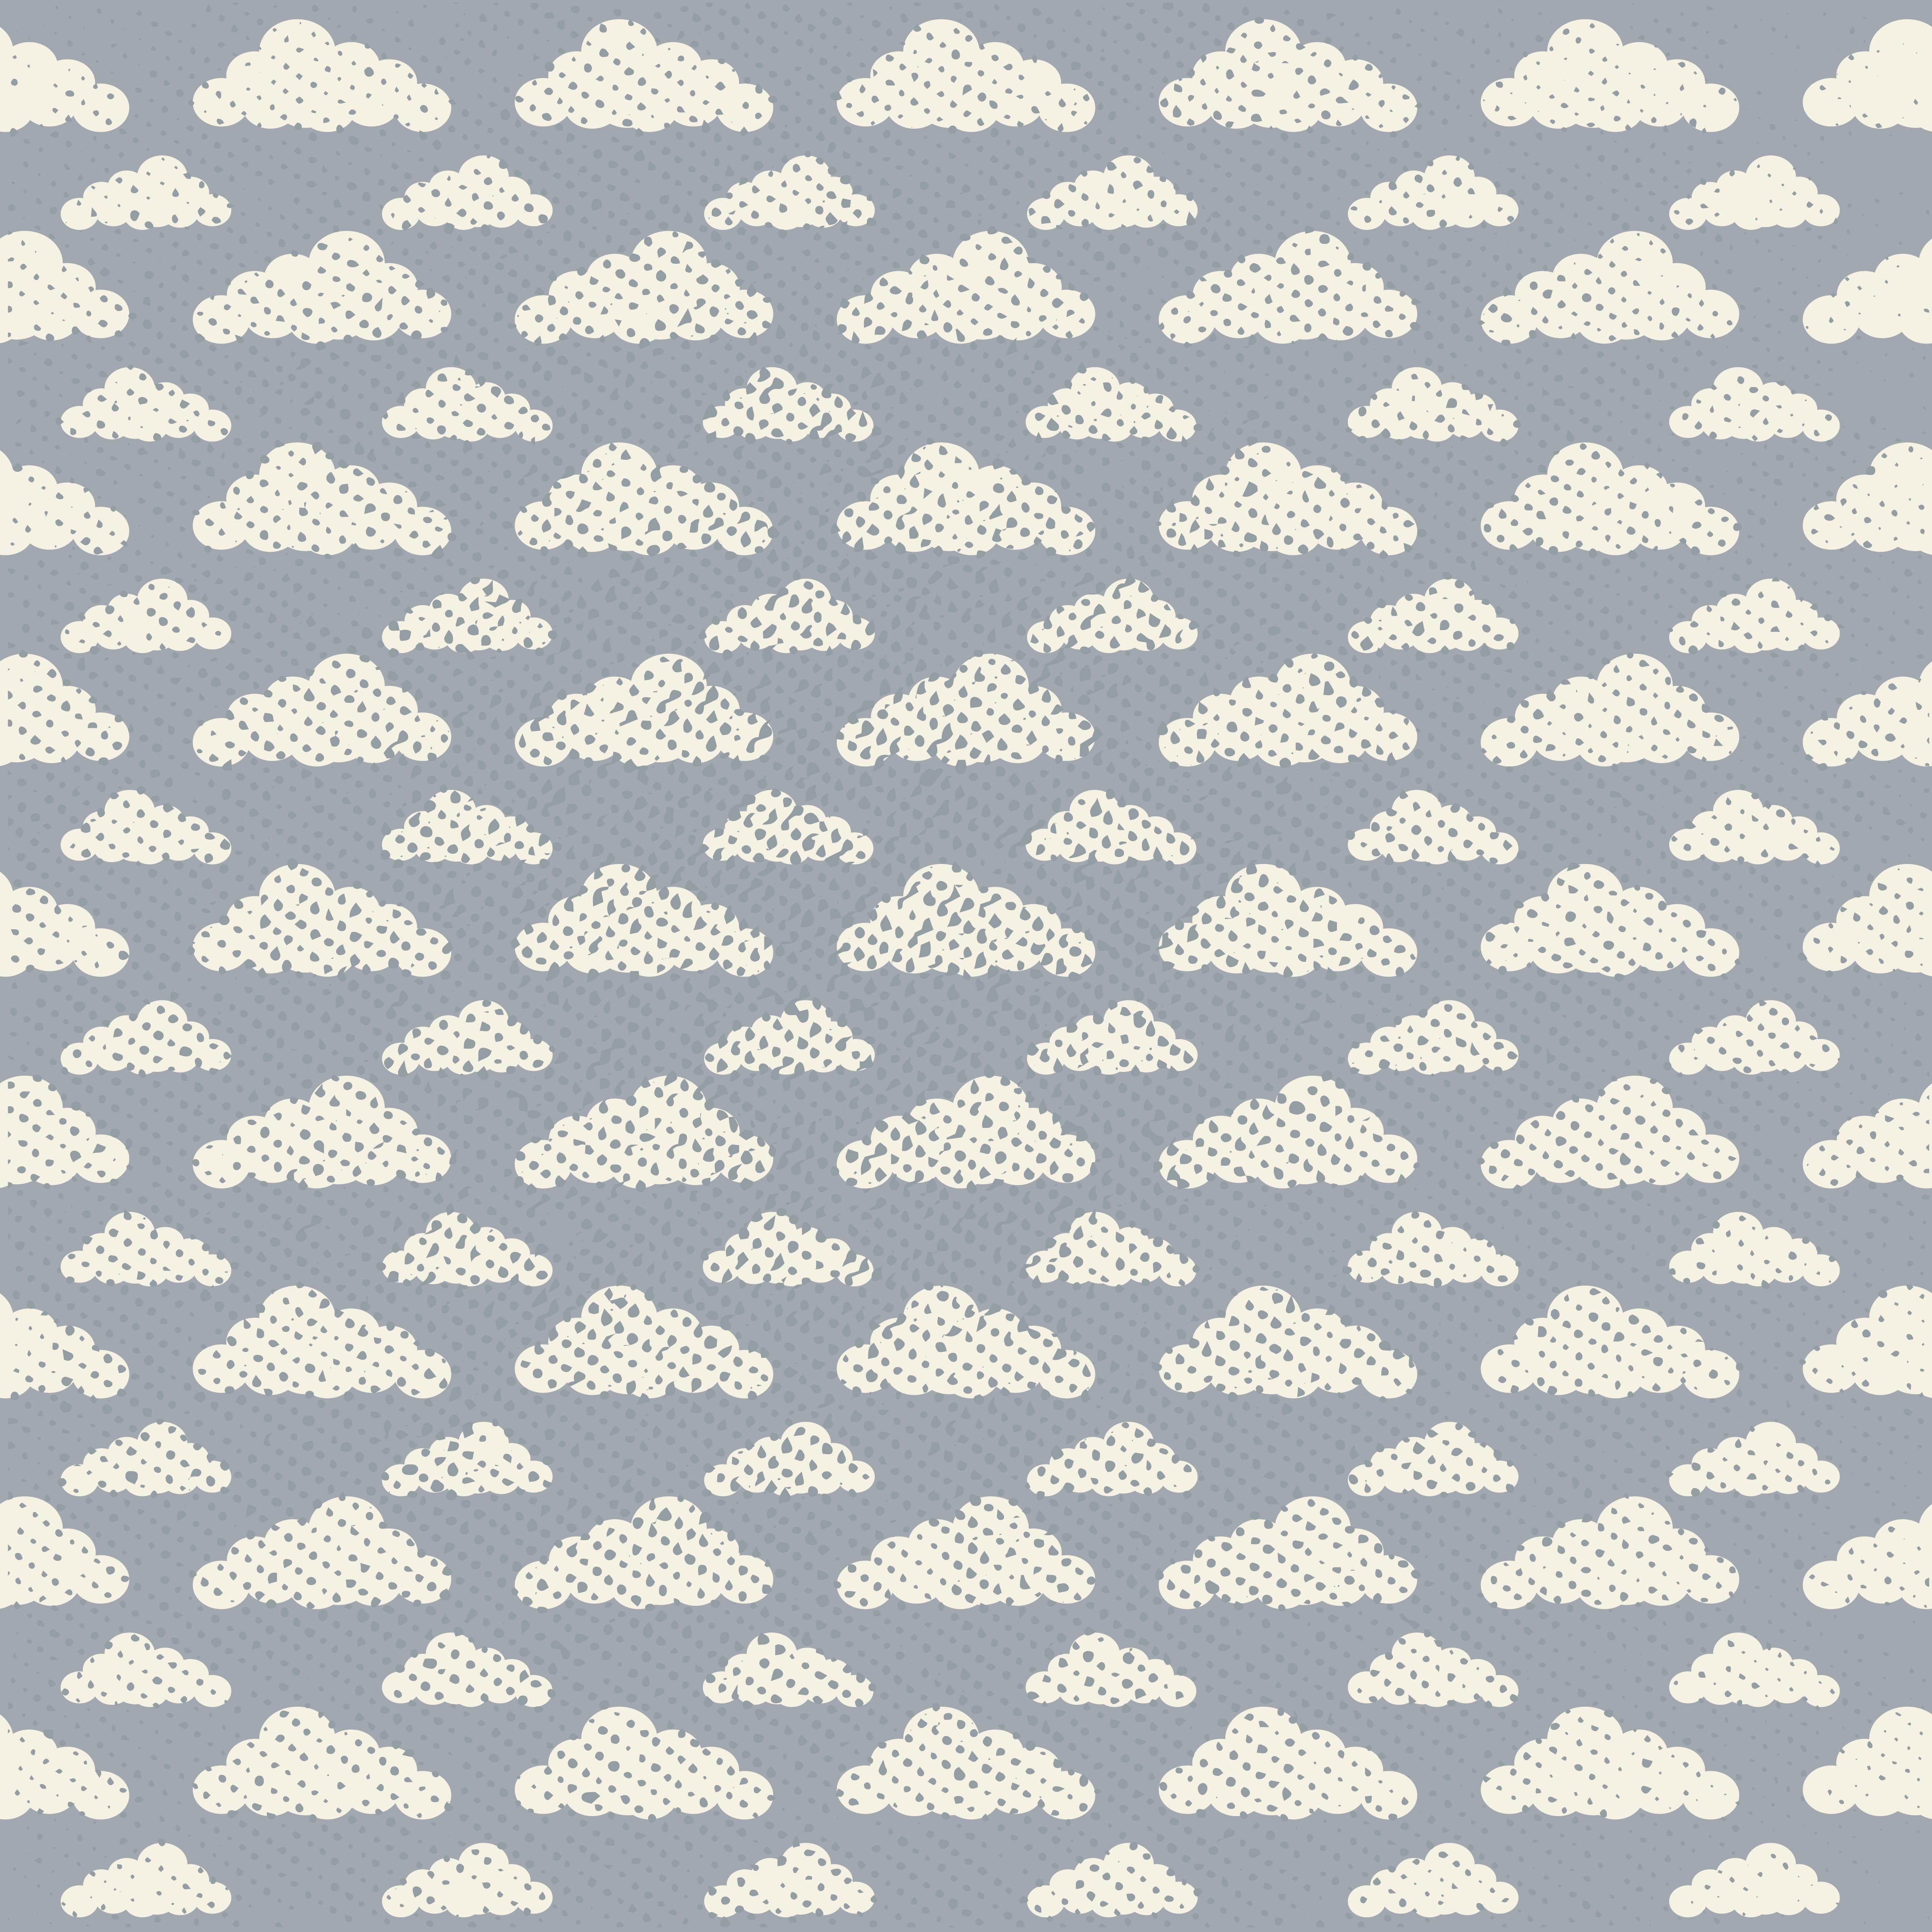 Vector Seamless Grunge Cloud Pattern - Download Free Vectors